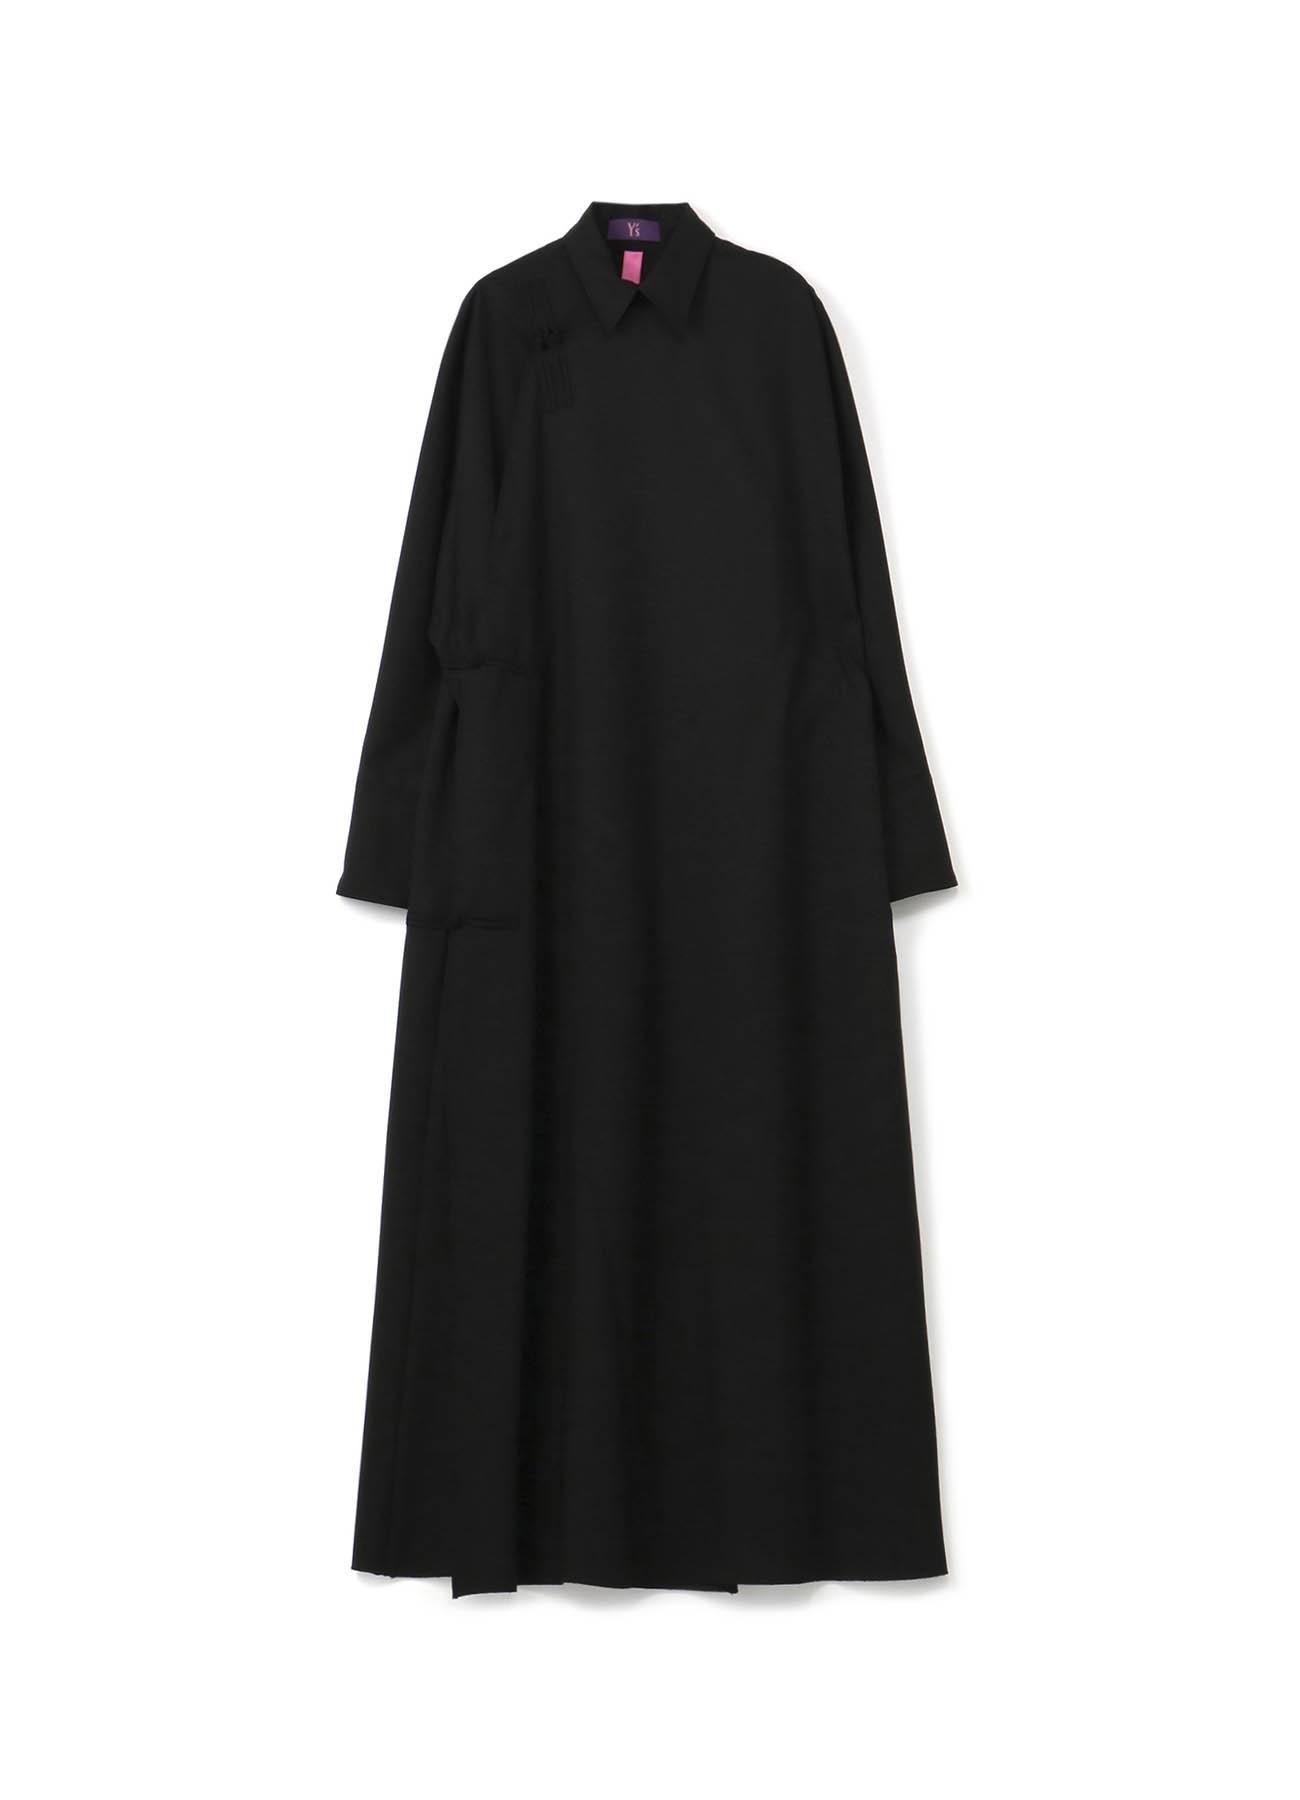 Y'sPINK ウールポリエステルトロピカル 釈迦釦ドレス